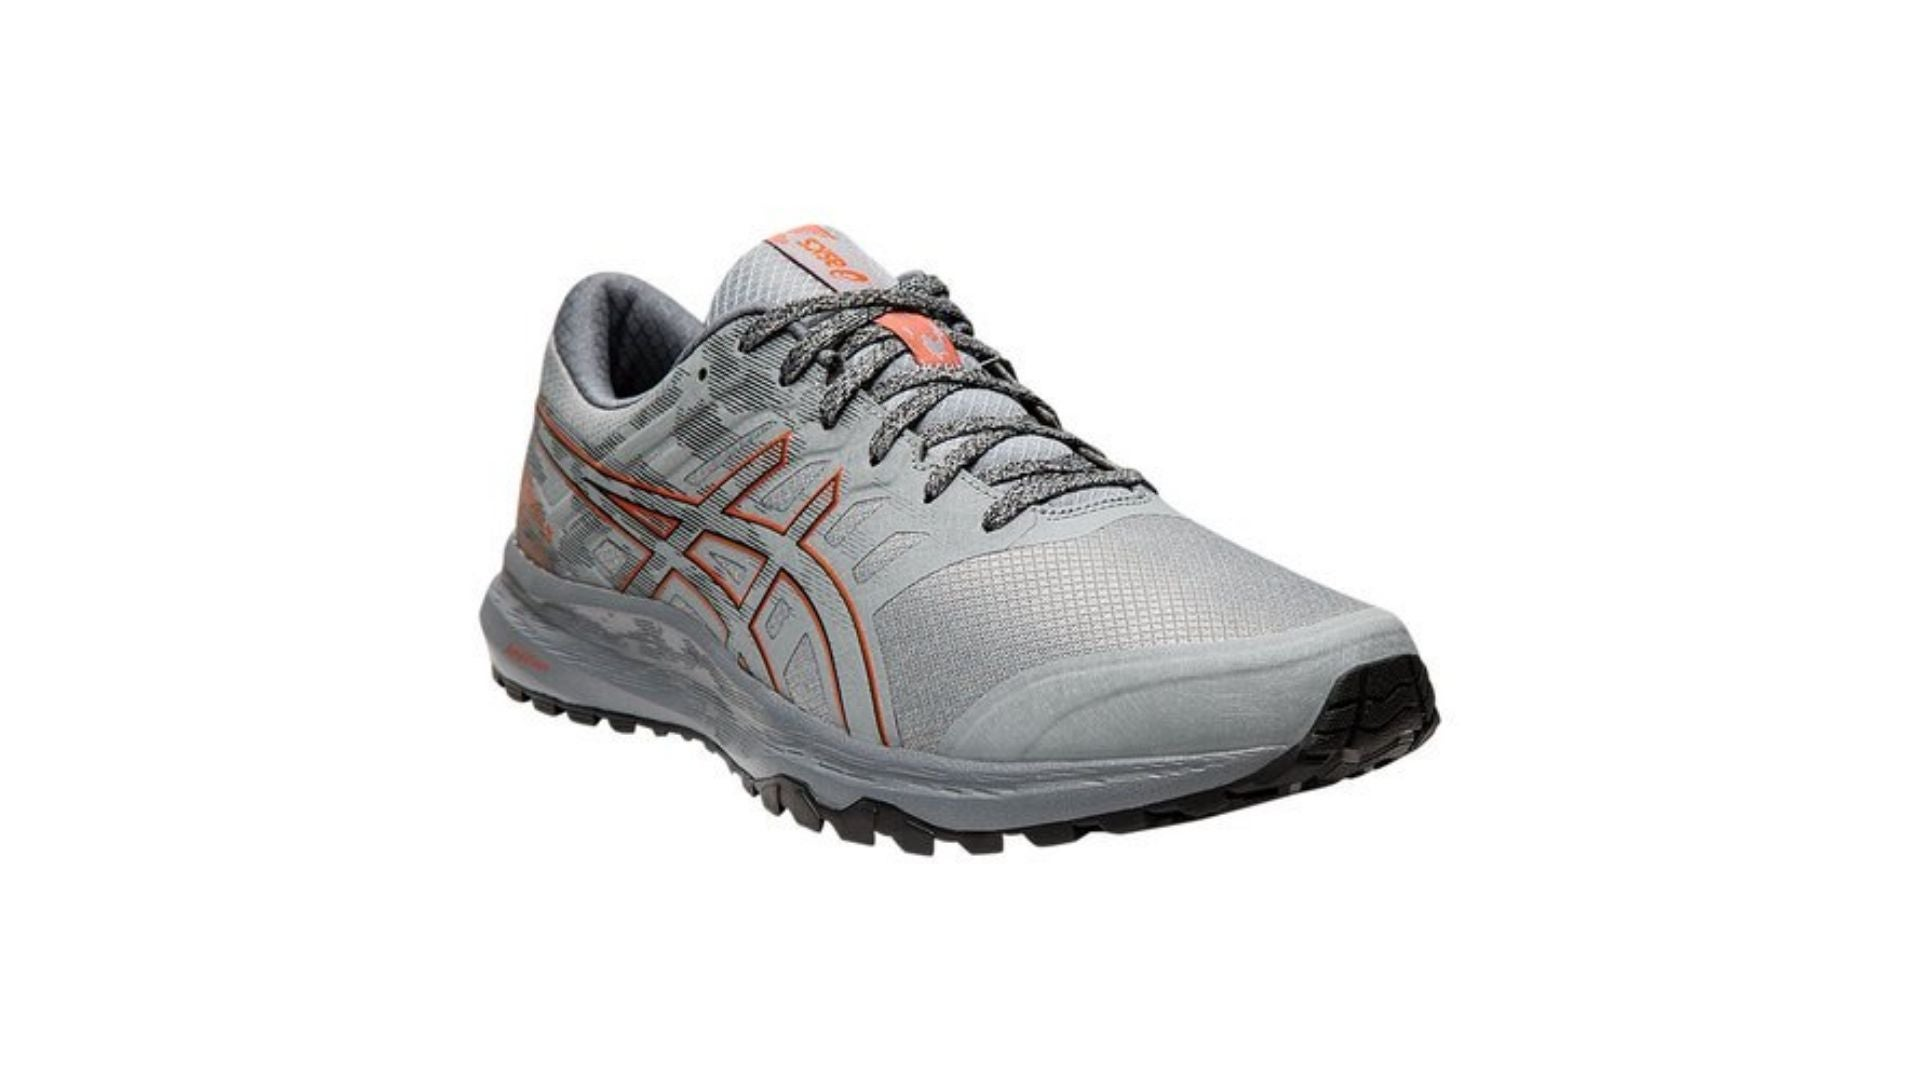 ASICS GEL-Scram 5 Trail Running Shoe